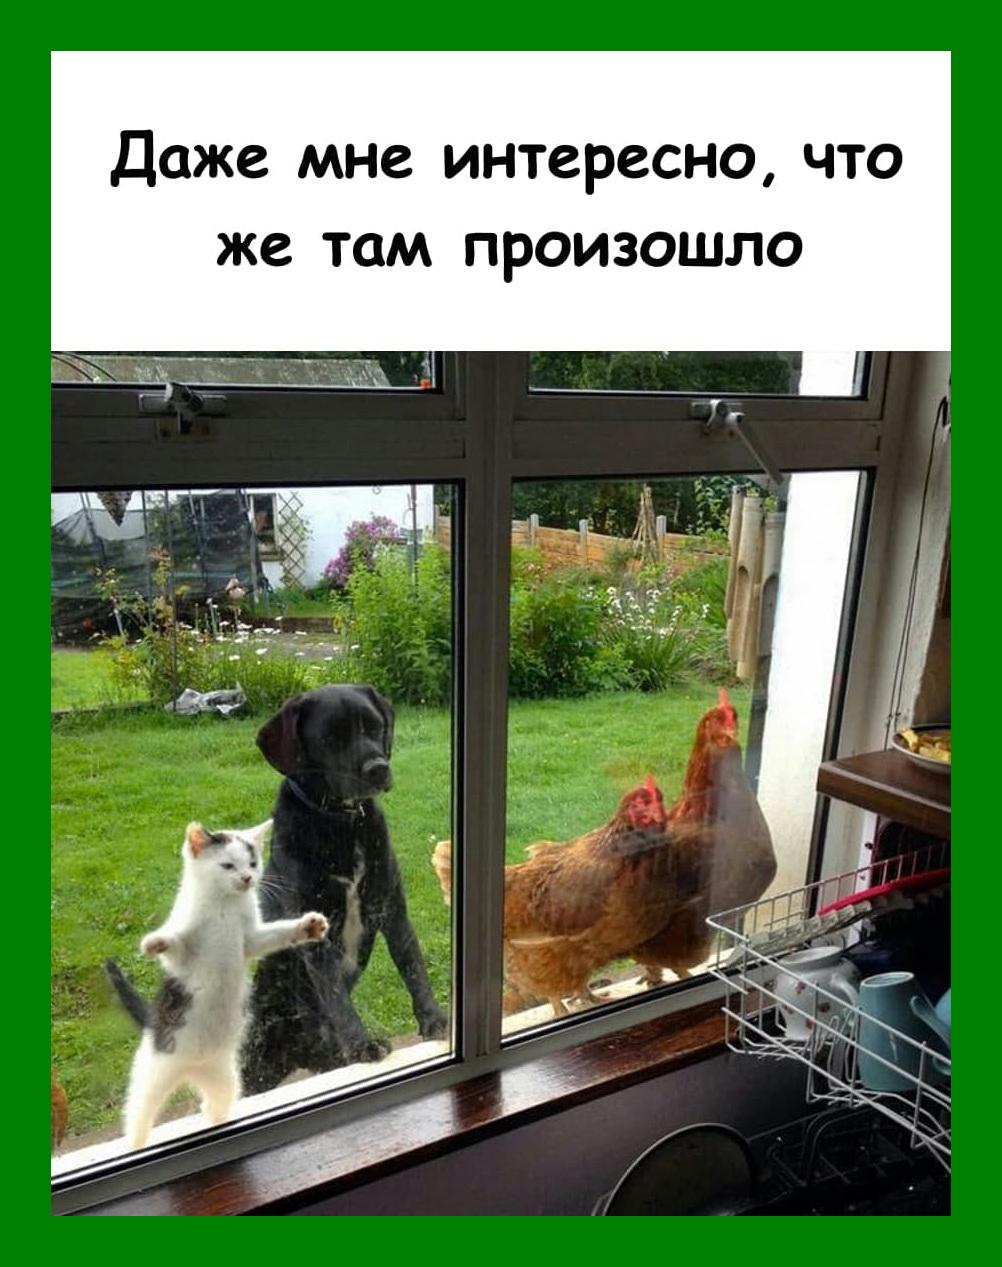 photo_2020-11-20_11-31-57%20%281%29.jpg